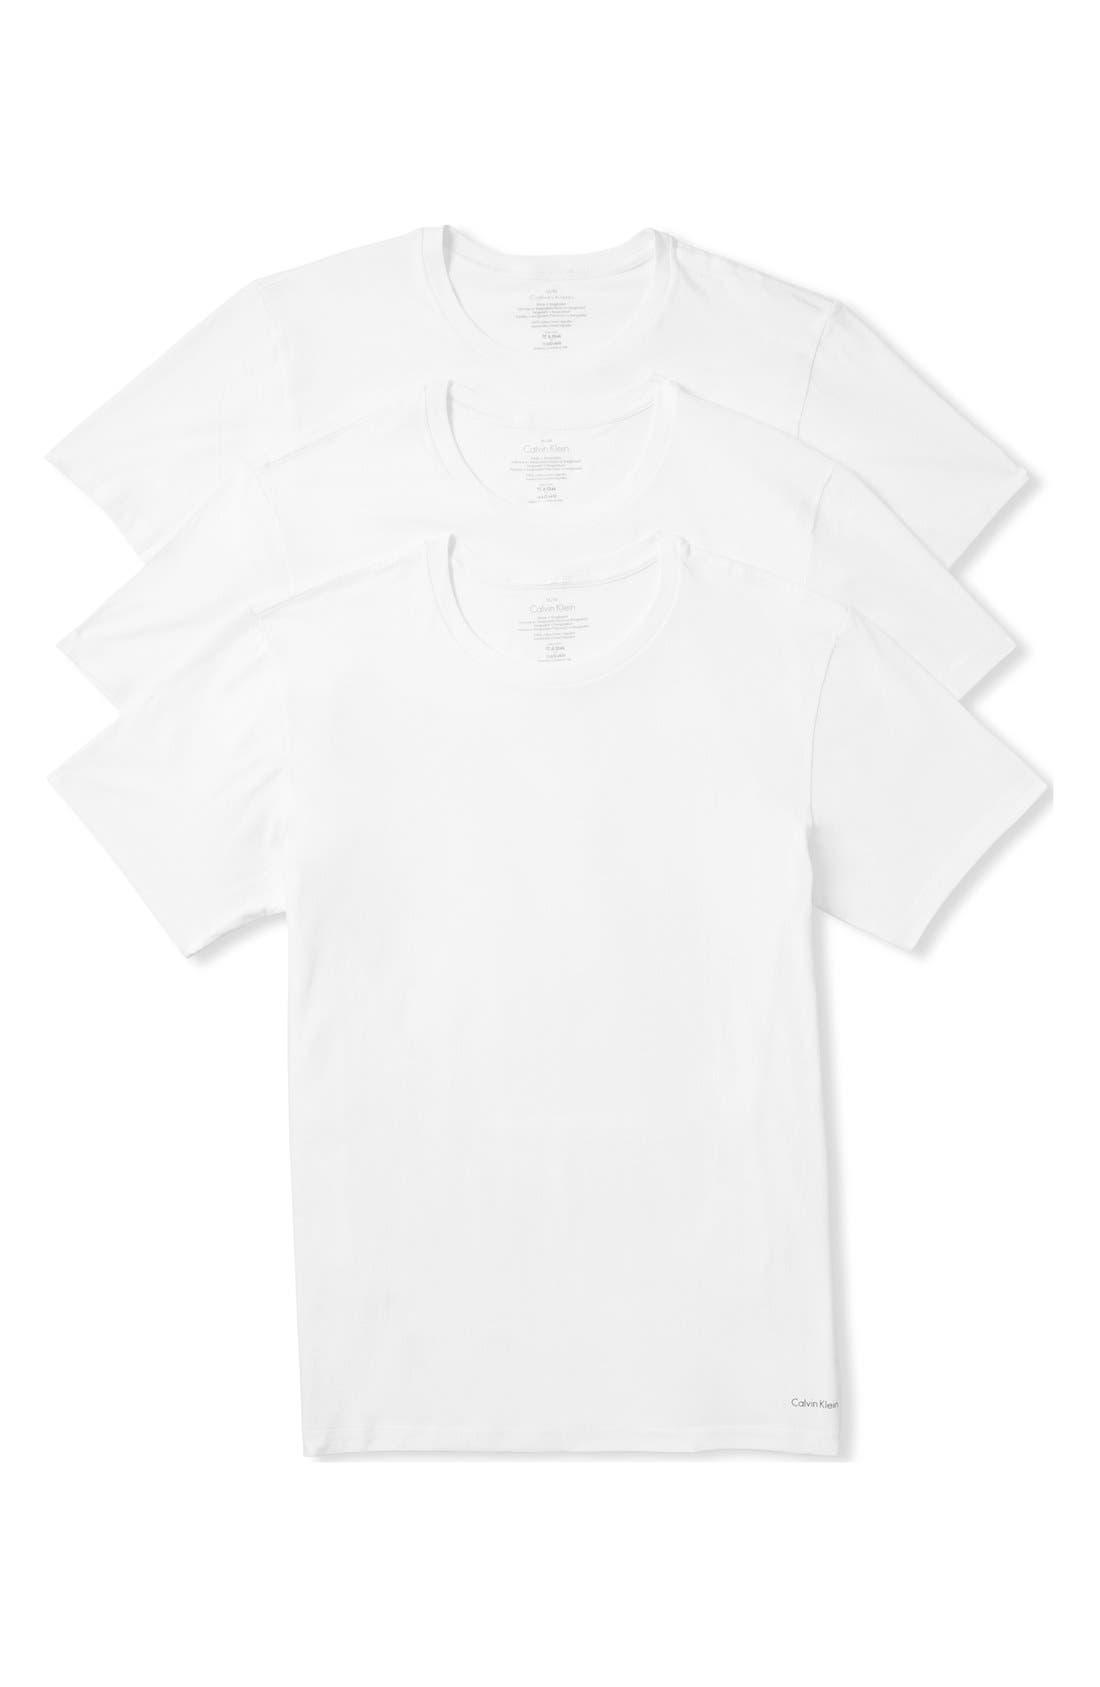 3-Pack Cotton T-Shirt,                             Main thumbnail 1, color,                             WHITE